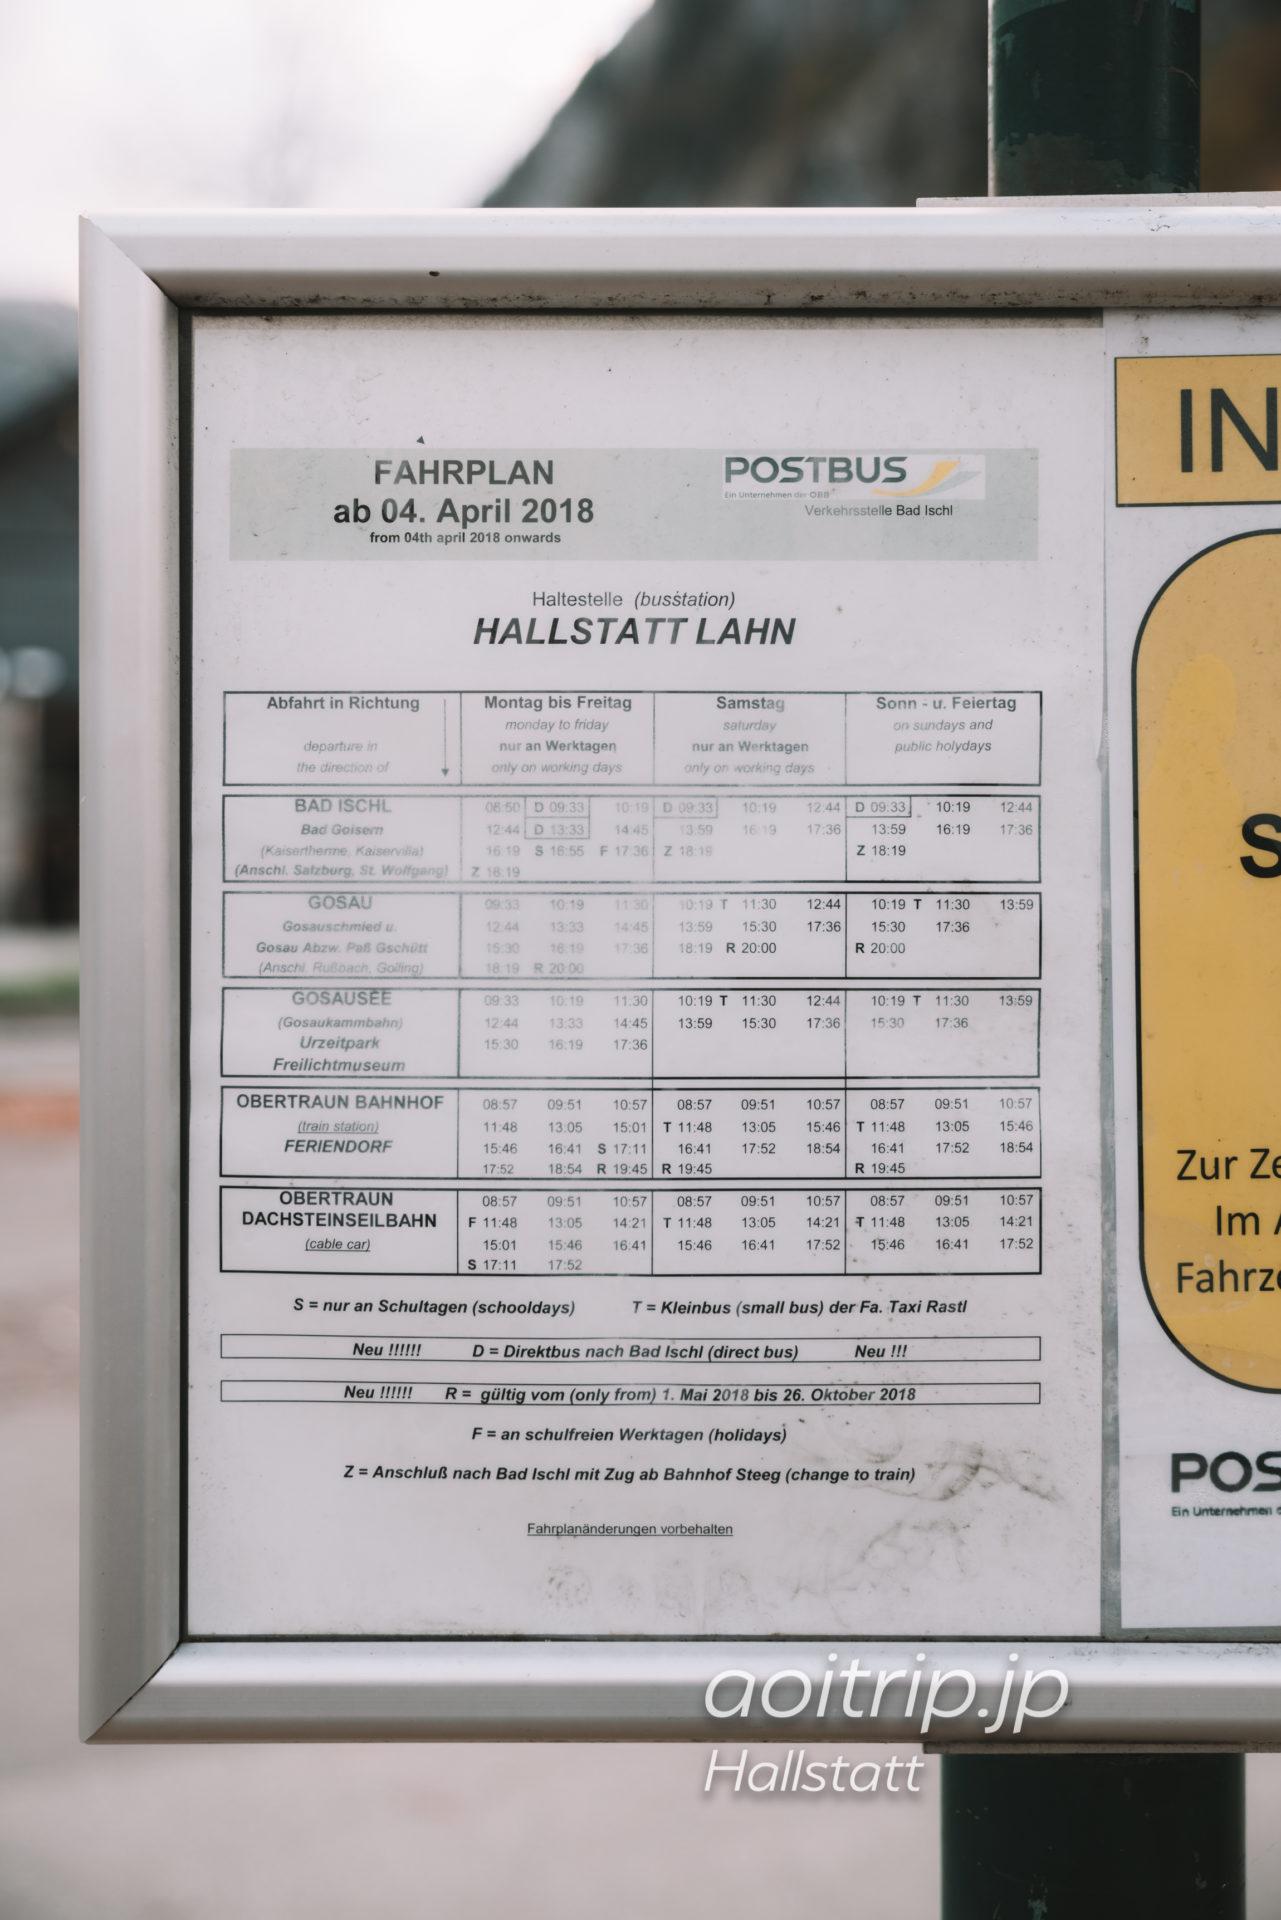 「Hallstatt Lahn(Seelände)」からロープウェイ乗り場「Obertraun Dachsteinseillbahn」行きのバス時刻表